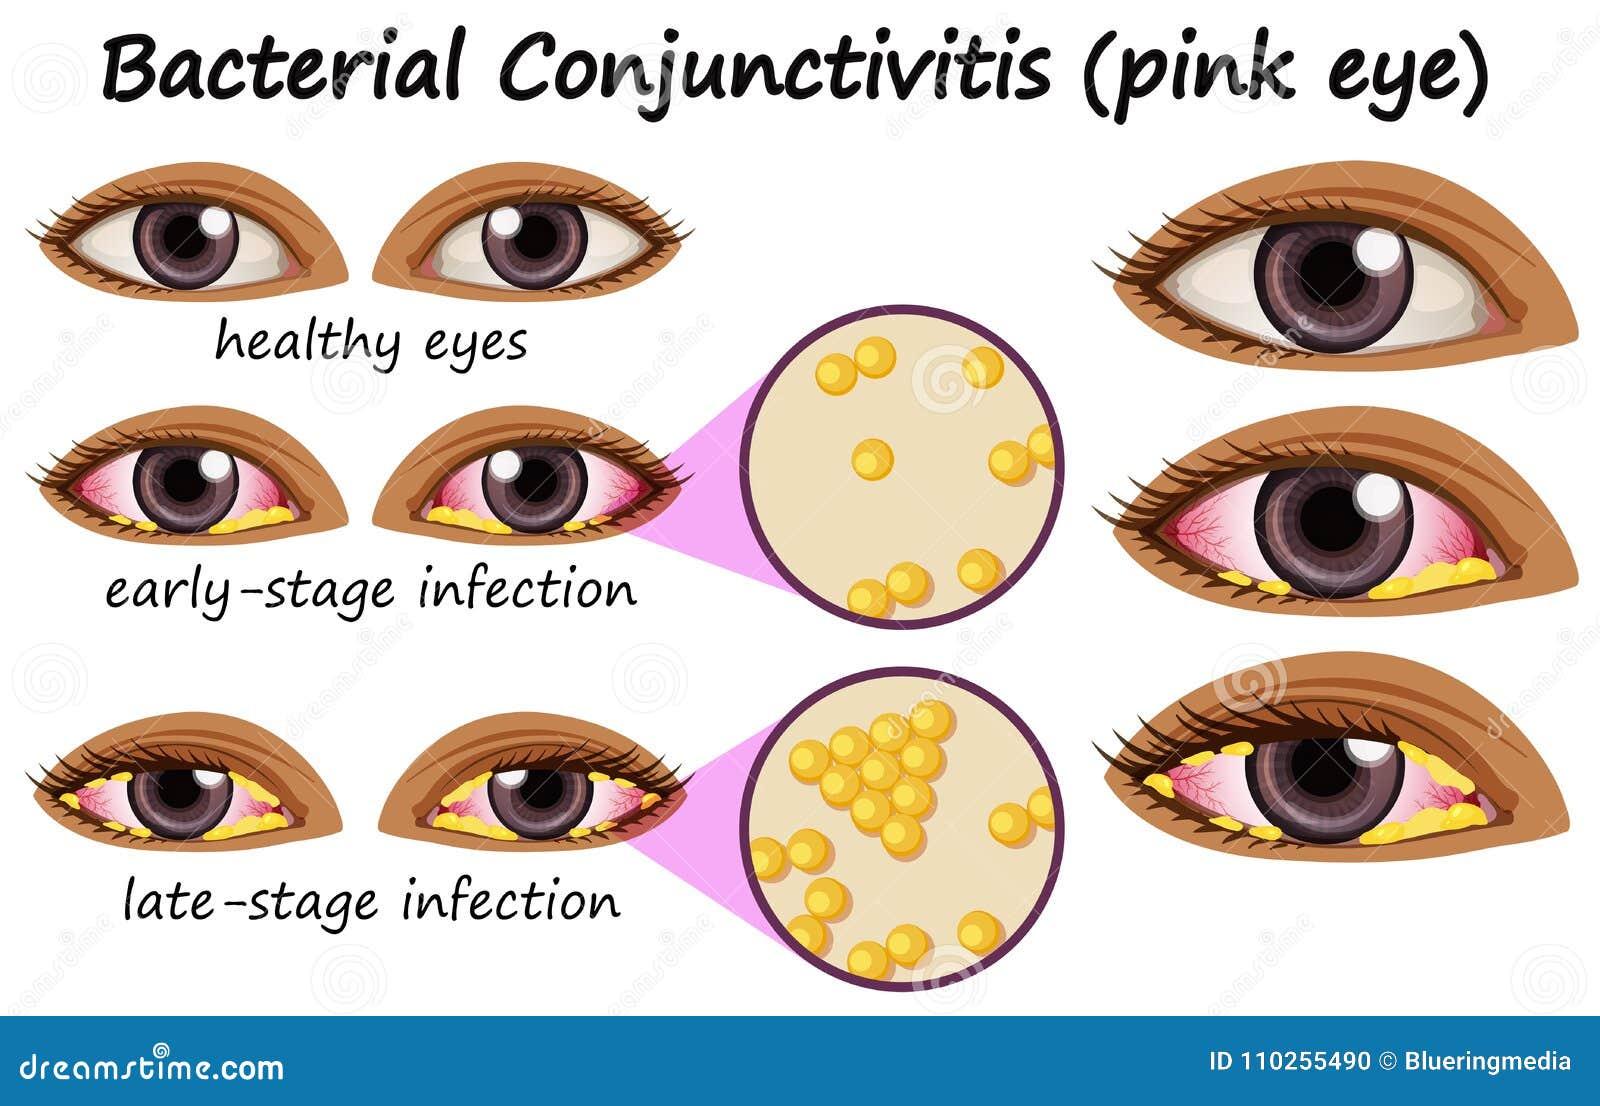 Pink Eye Diagram Wiring Libraries Toyota Engine 3ye Showing Bacterial Conjunctivitis In Human Stock Vectordiagram